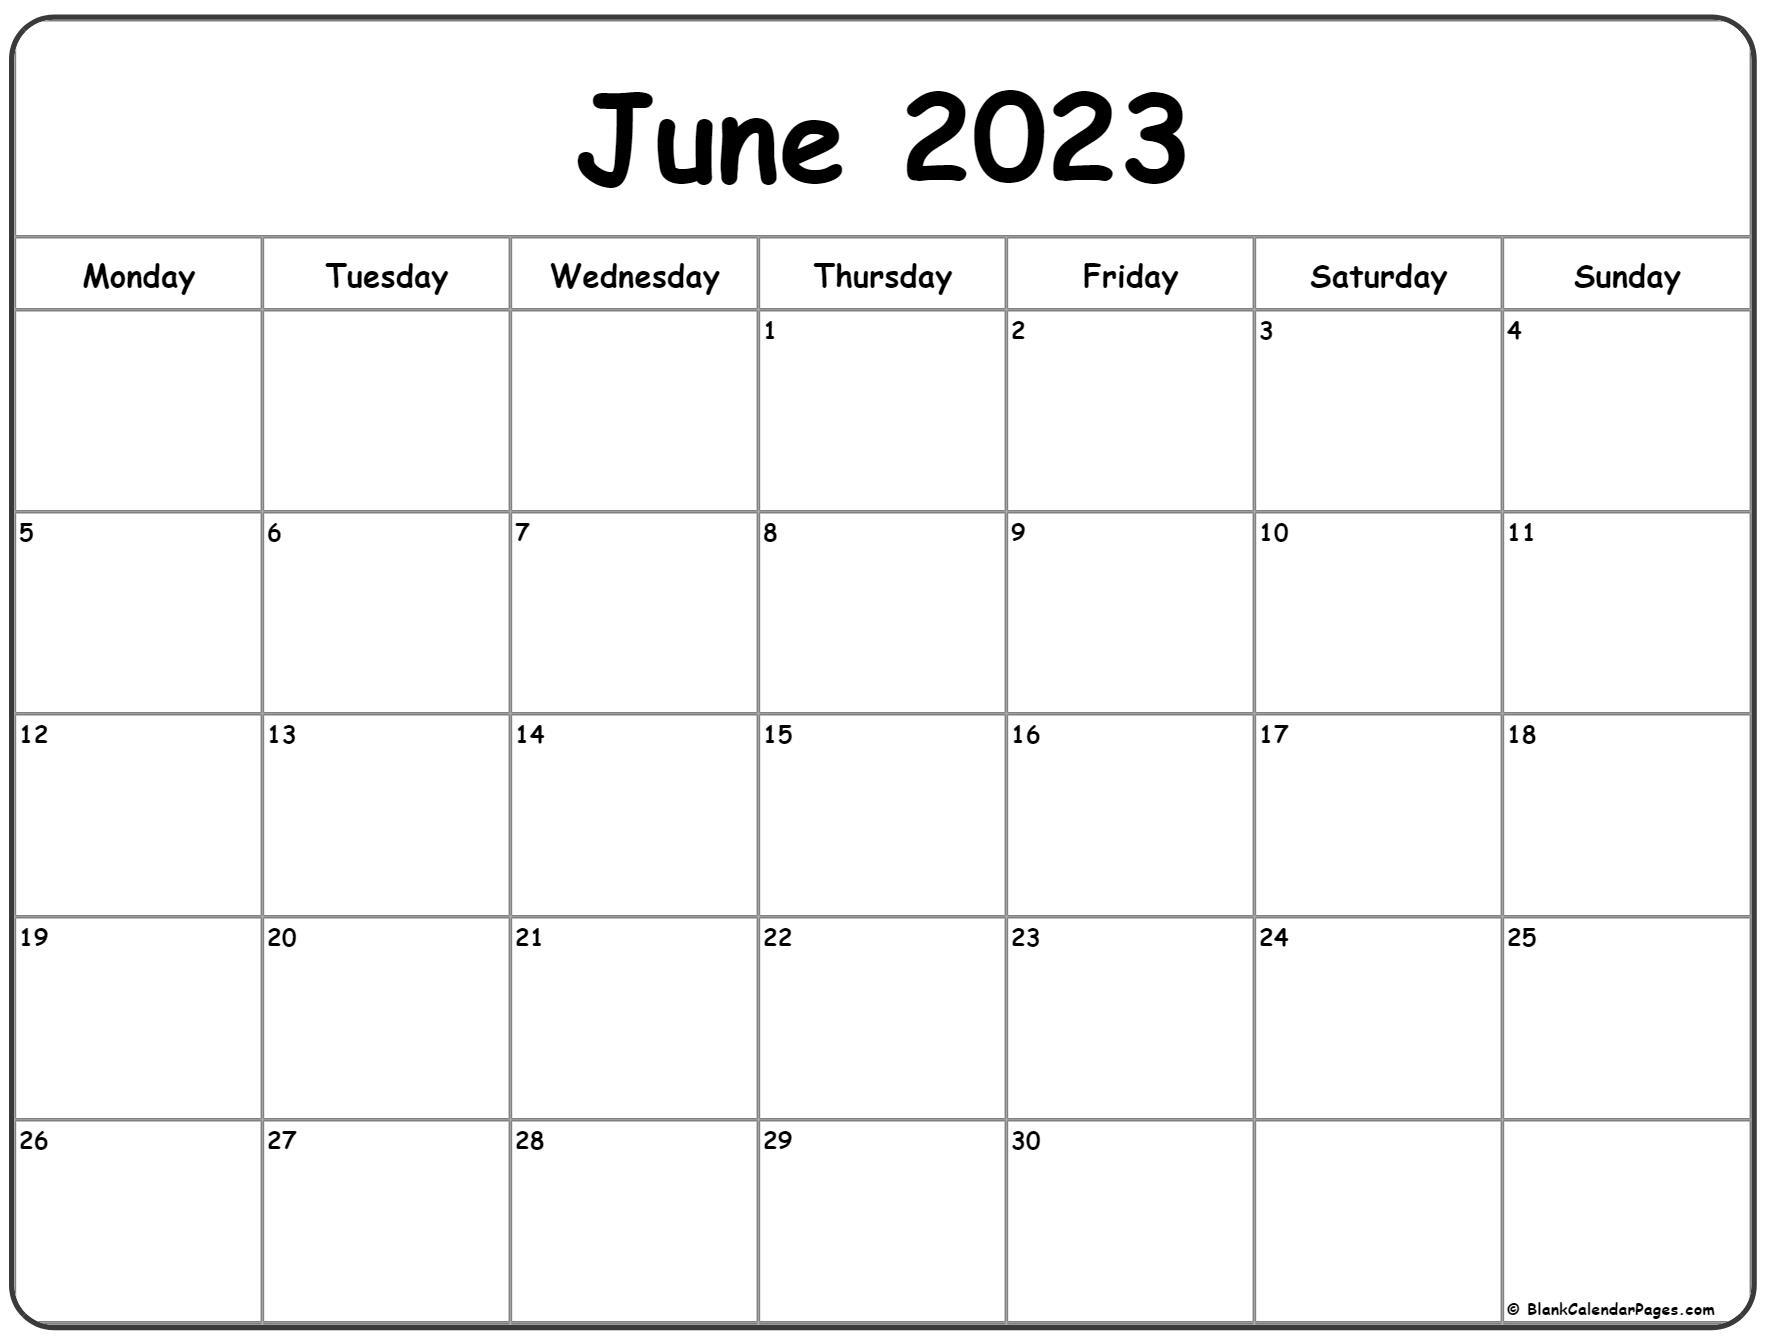 June 2023 Monday calendar. Monday to Sunday